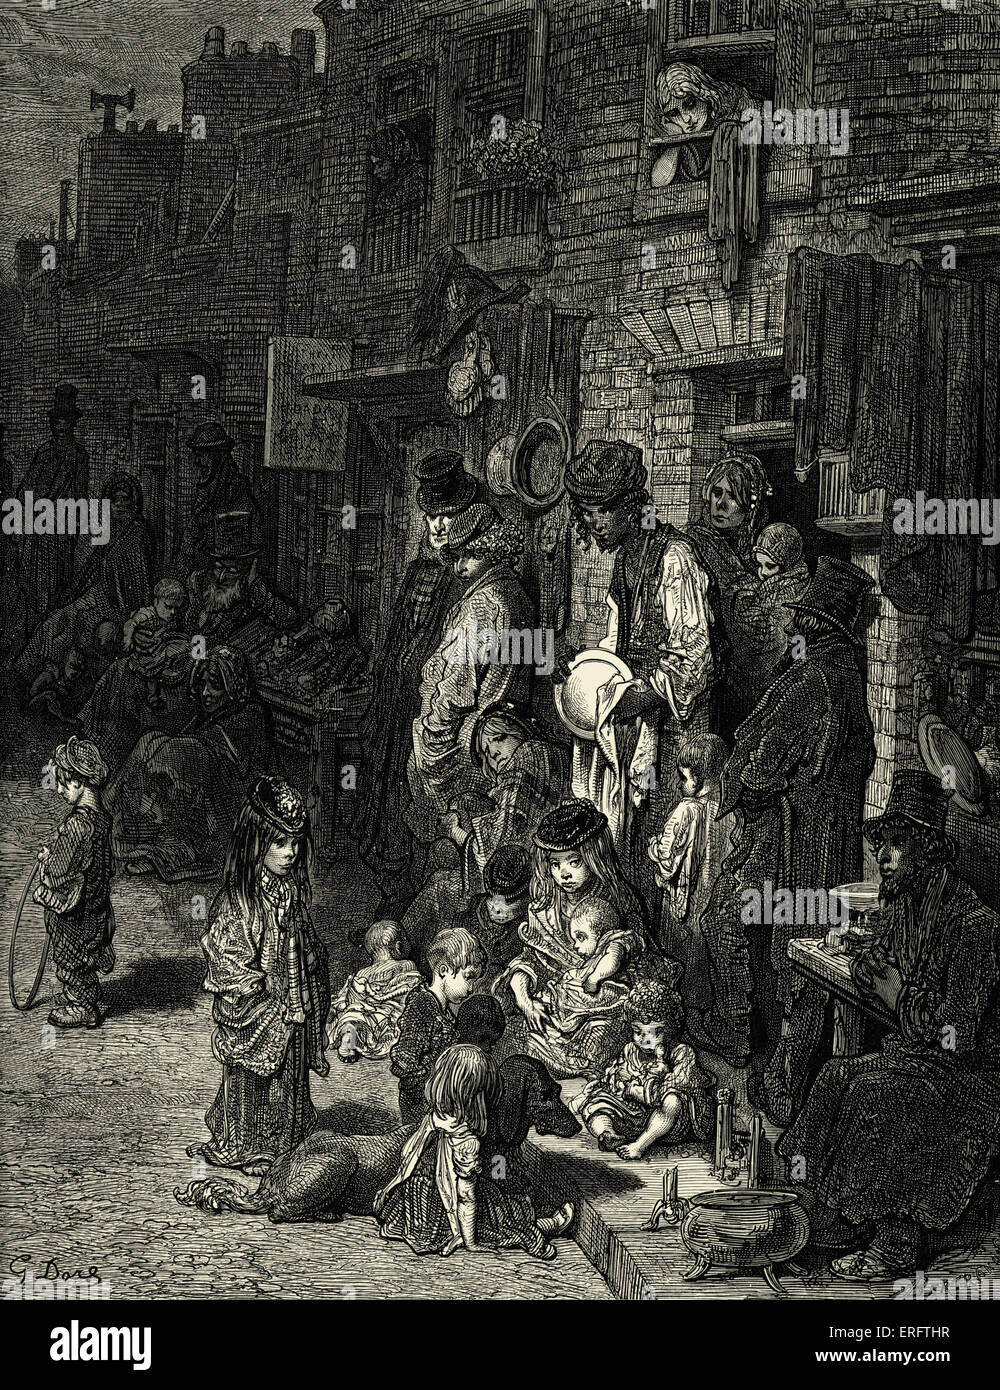 East End London: Victorian London- Whitechapel, Wentworth Street. East End